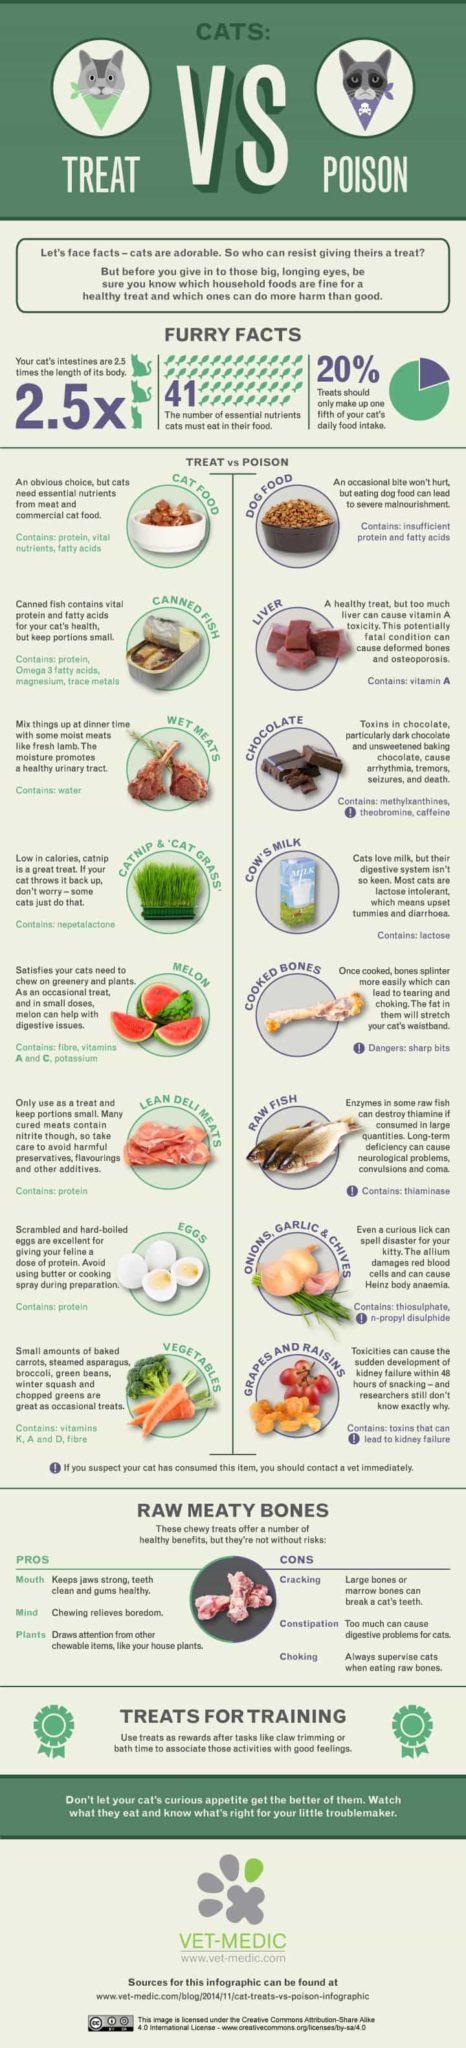 cat treat vs poison infographic